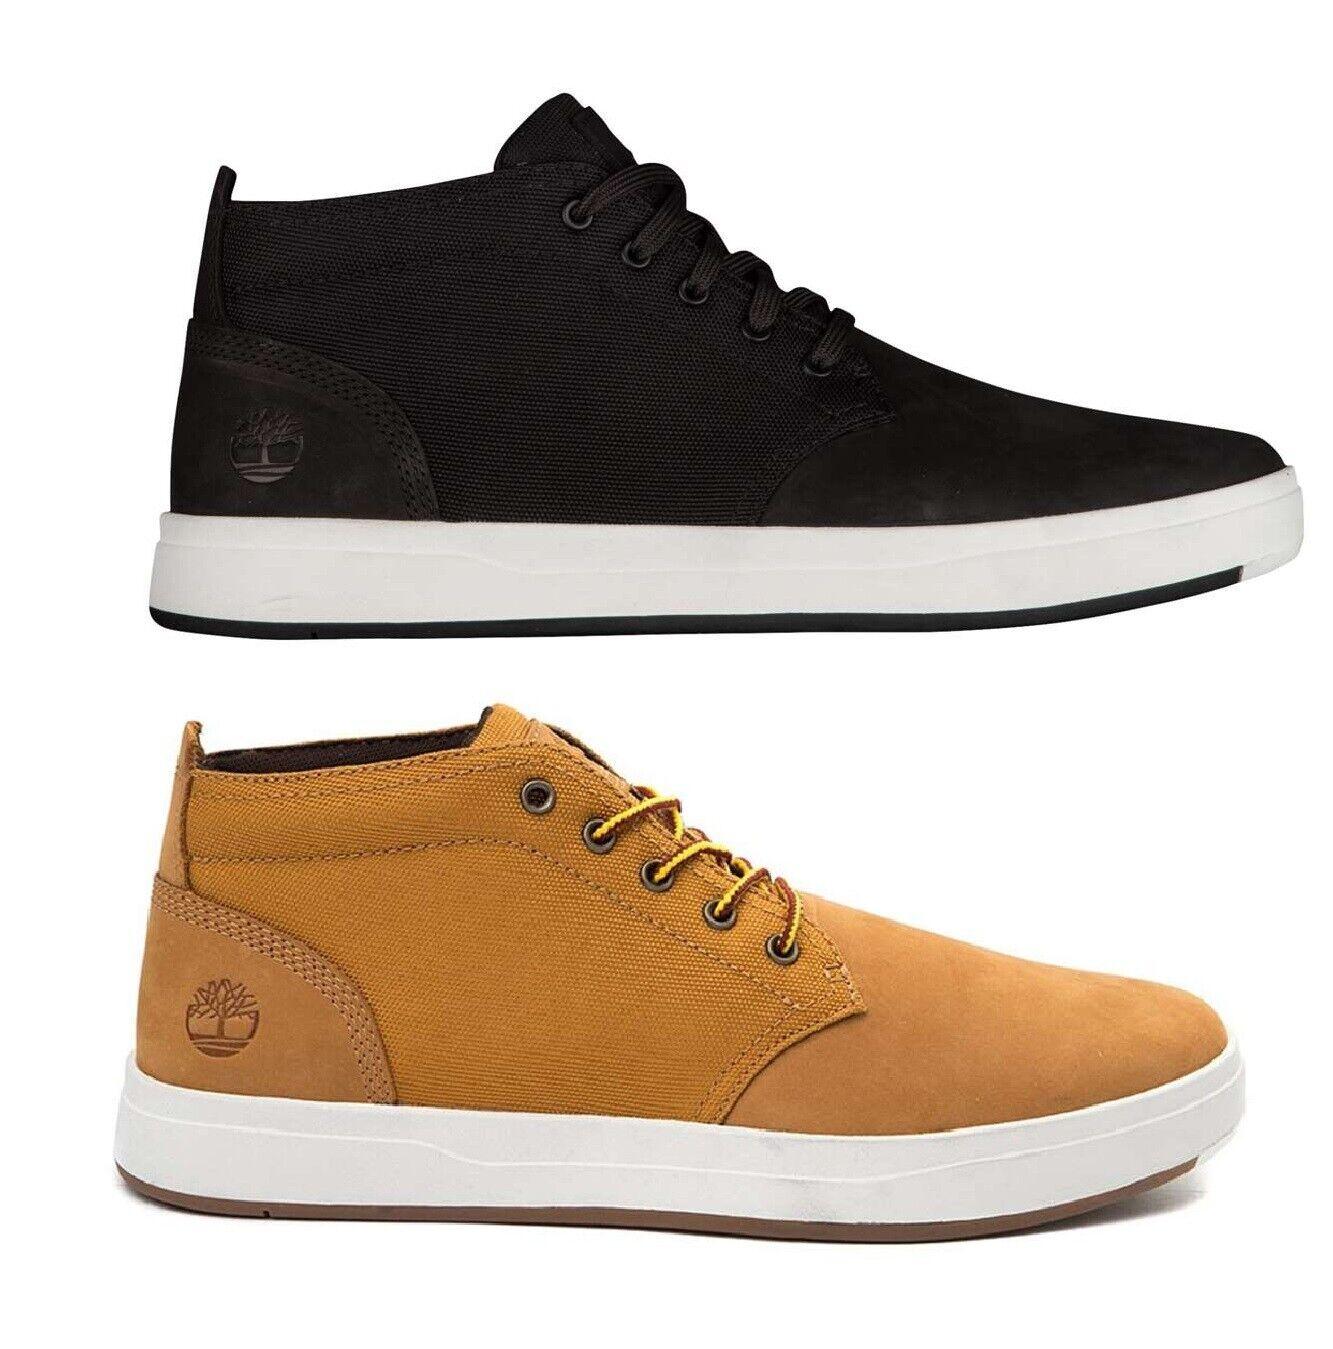 Timberland Men's Davis Square Chukka Leather Boots Ortholite